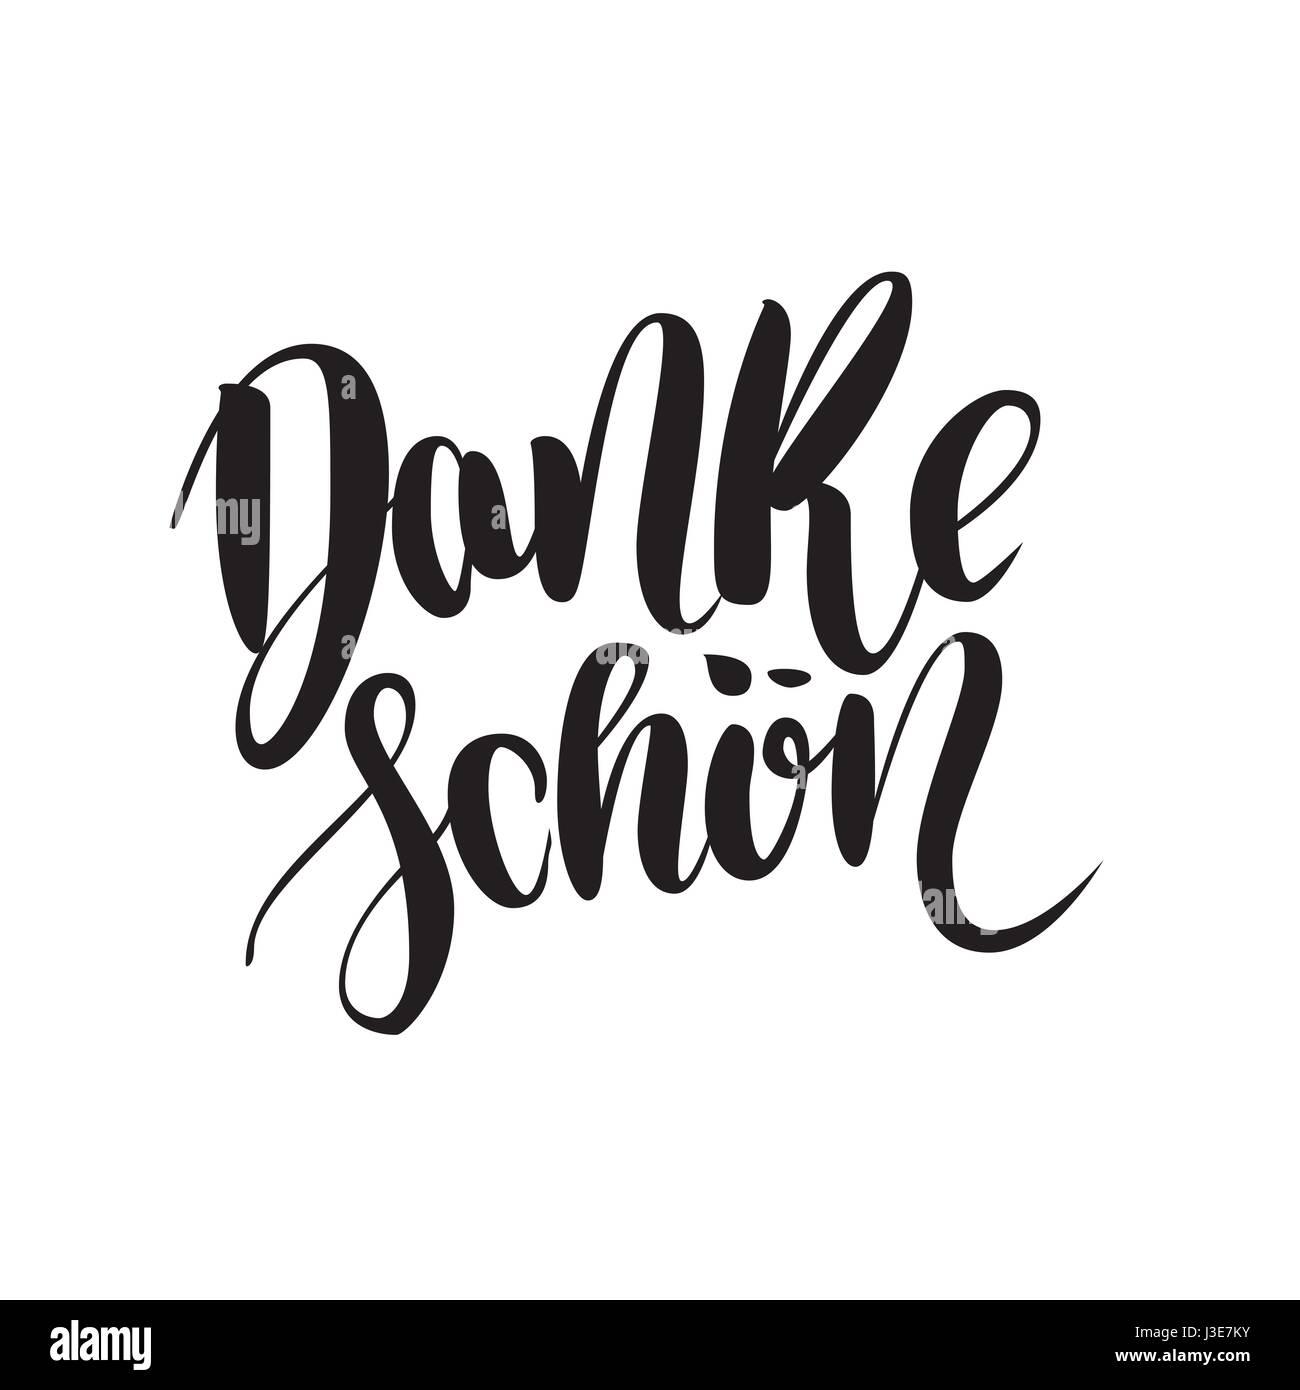 Thank You. Danke Schoen. German Language Balck Vector Lettering isolated on White Background. Hand-written words Stock Vector